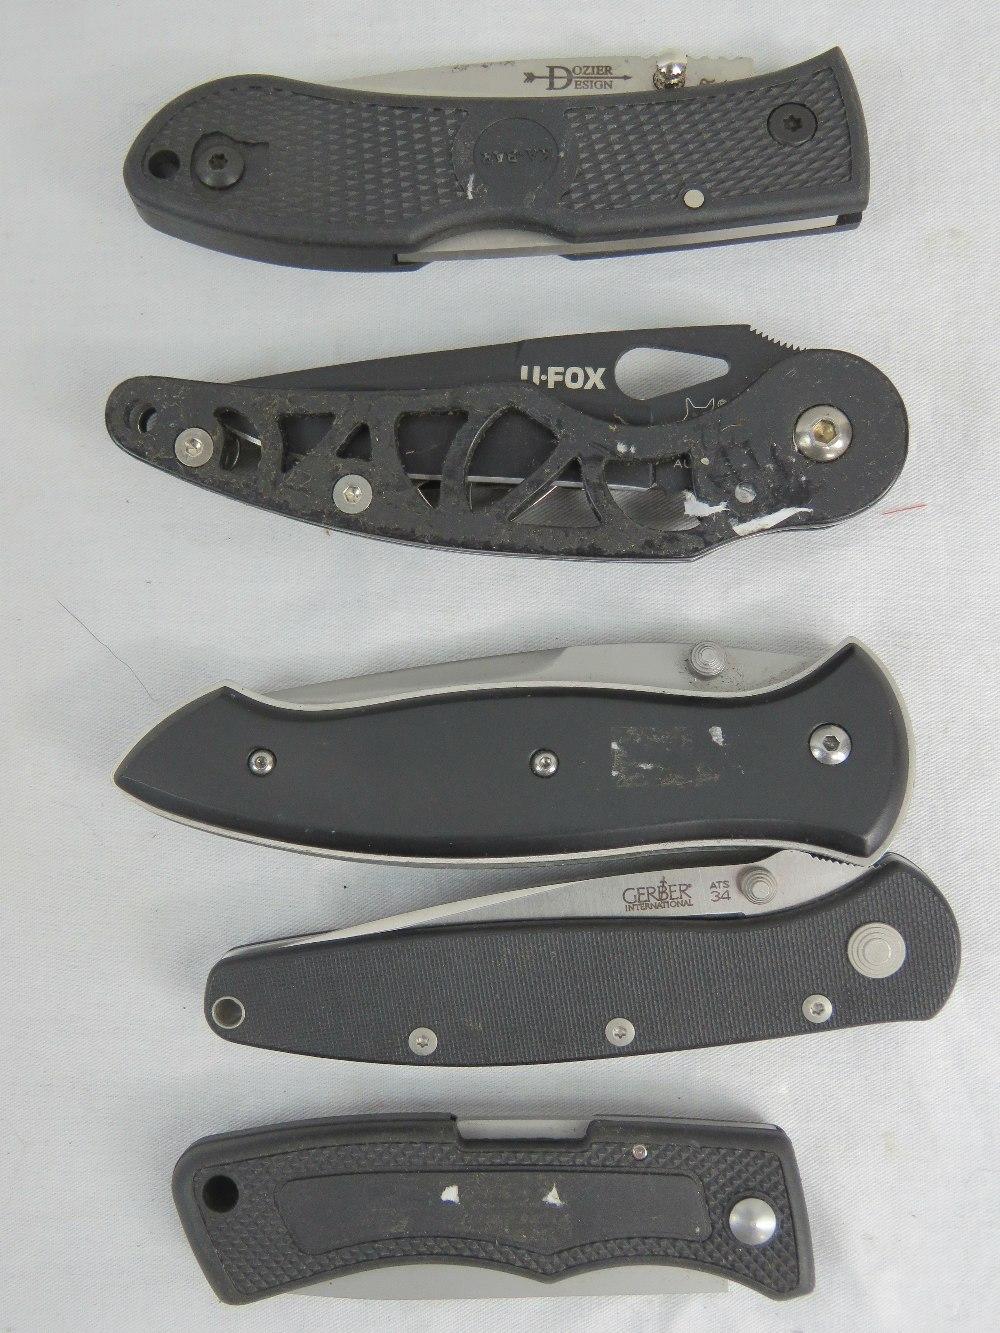 Lot 70 - Five lock knives including; Gerber, CRKT